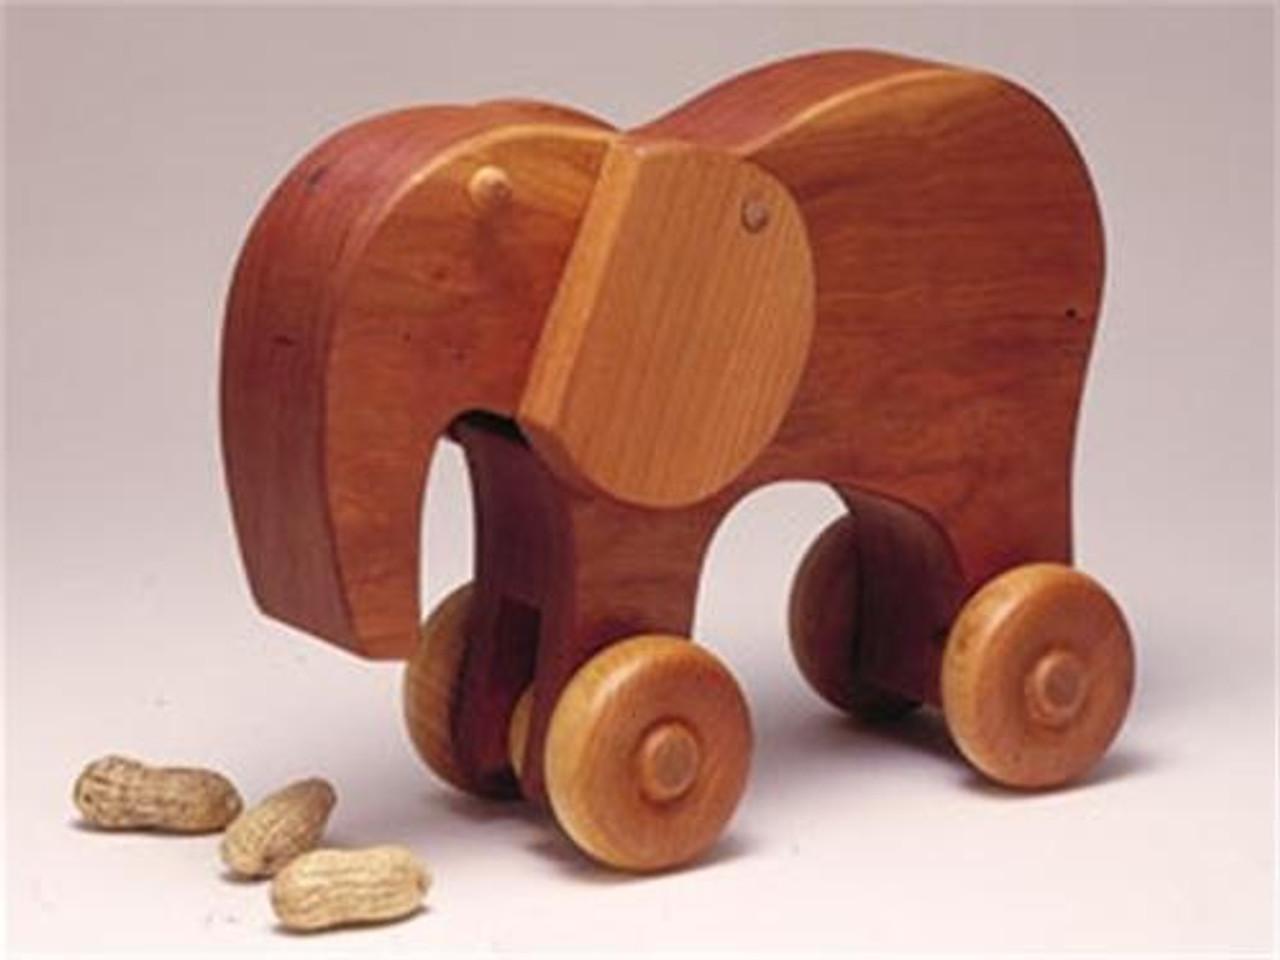 Cherry Tree Toys Eli The Elephant Plan